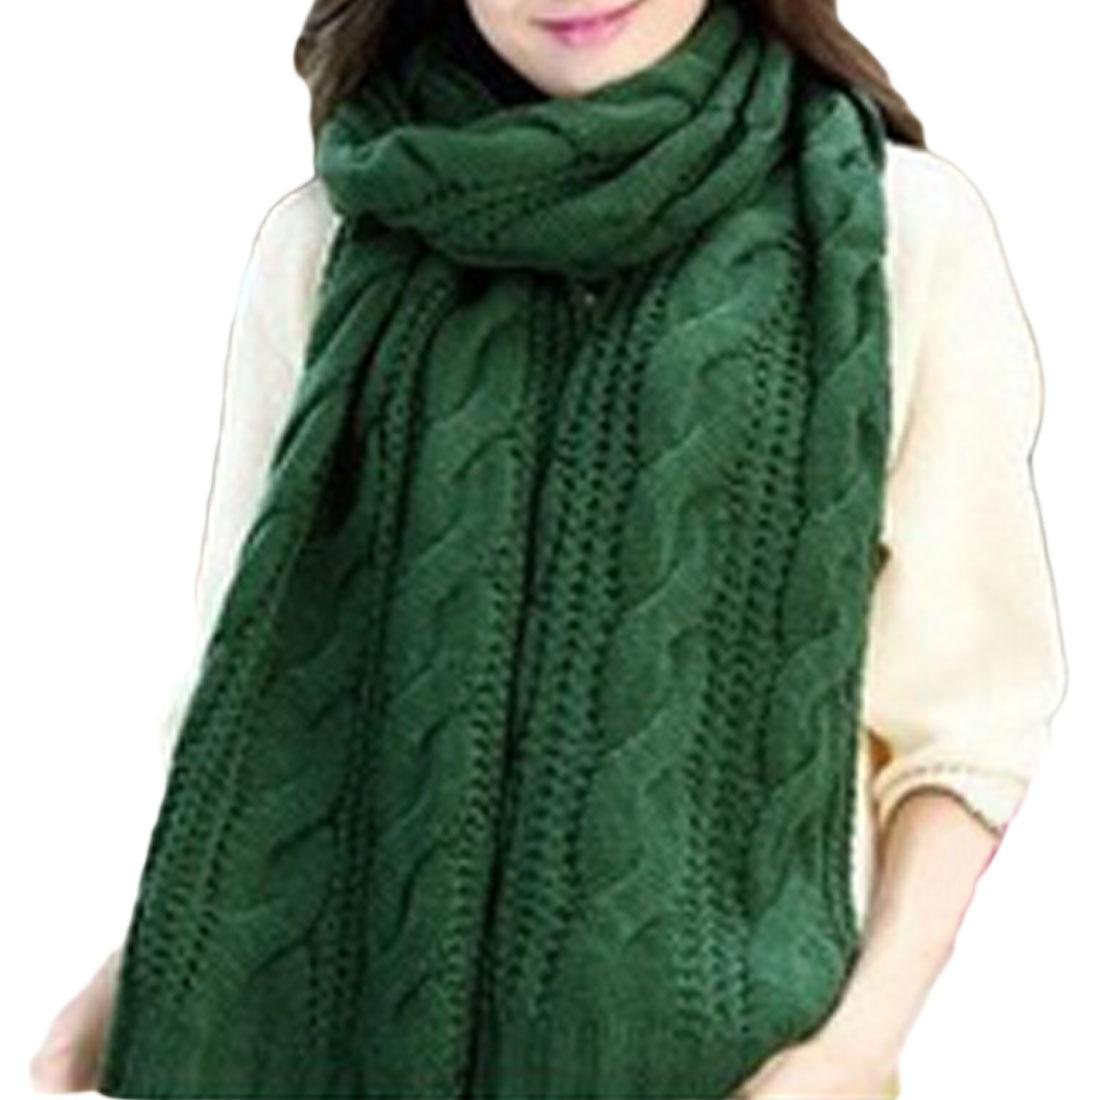 Hot Cirkel Kabel Haak Knit Sjaal Wrap Winter Warme Col Gember Geel